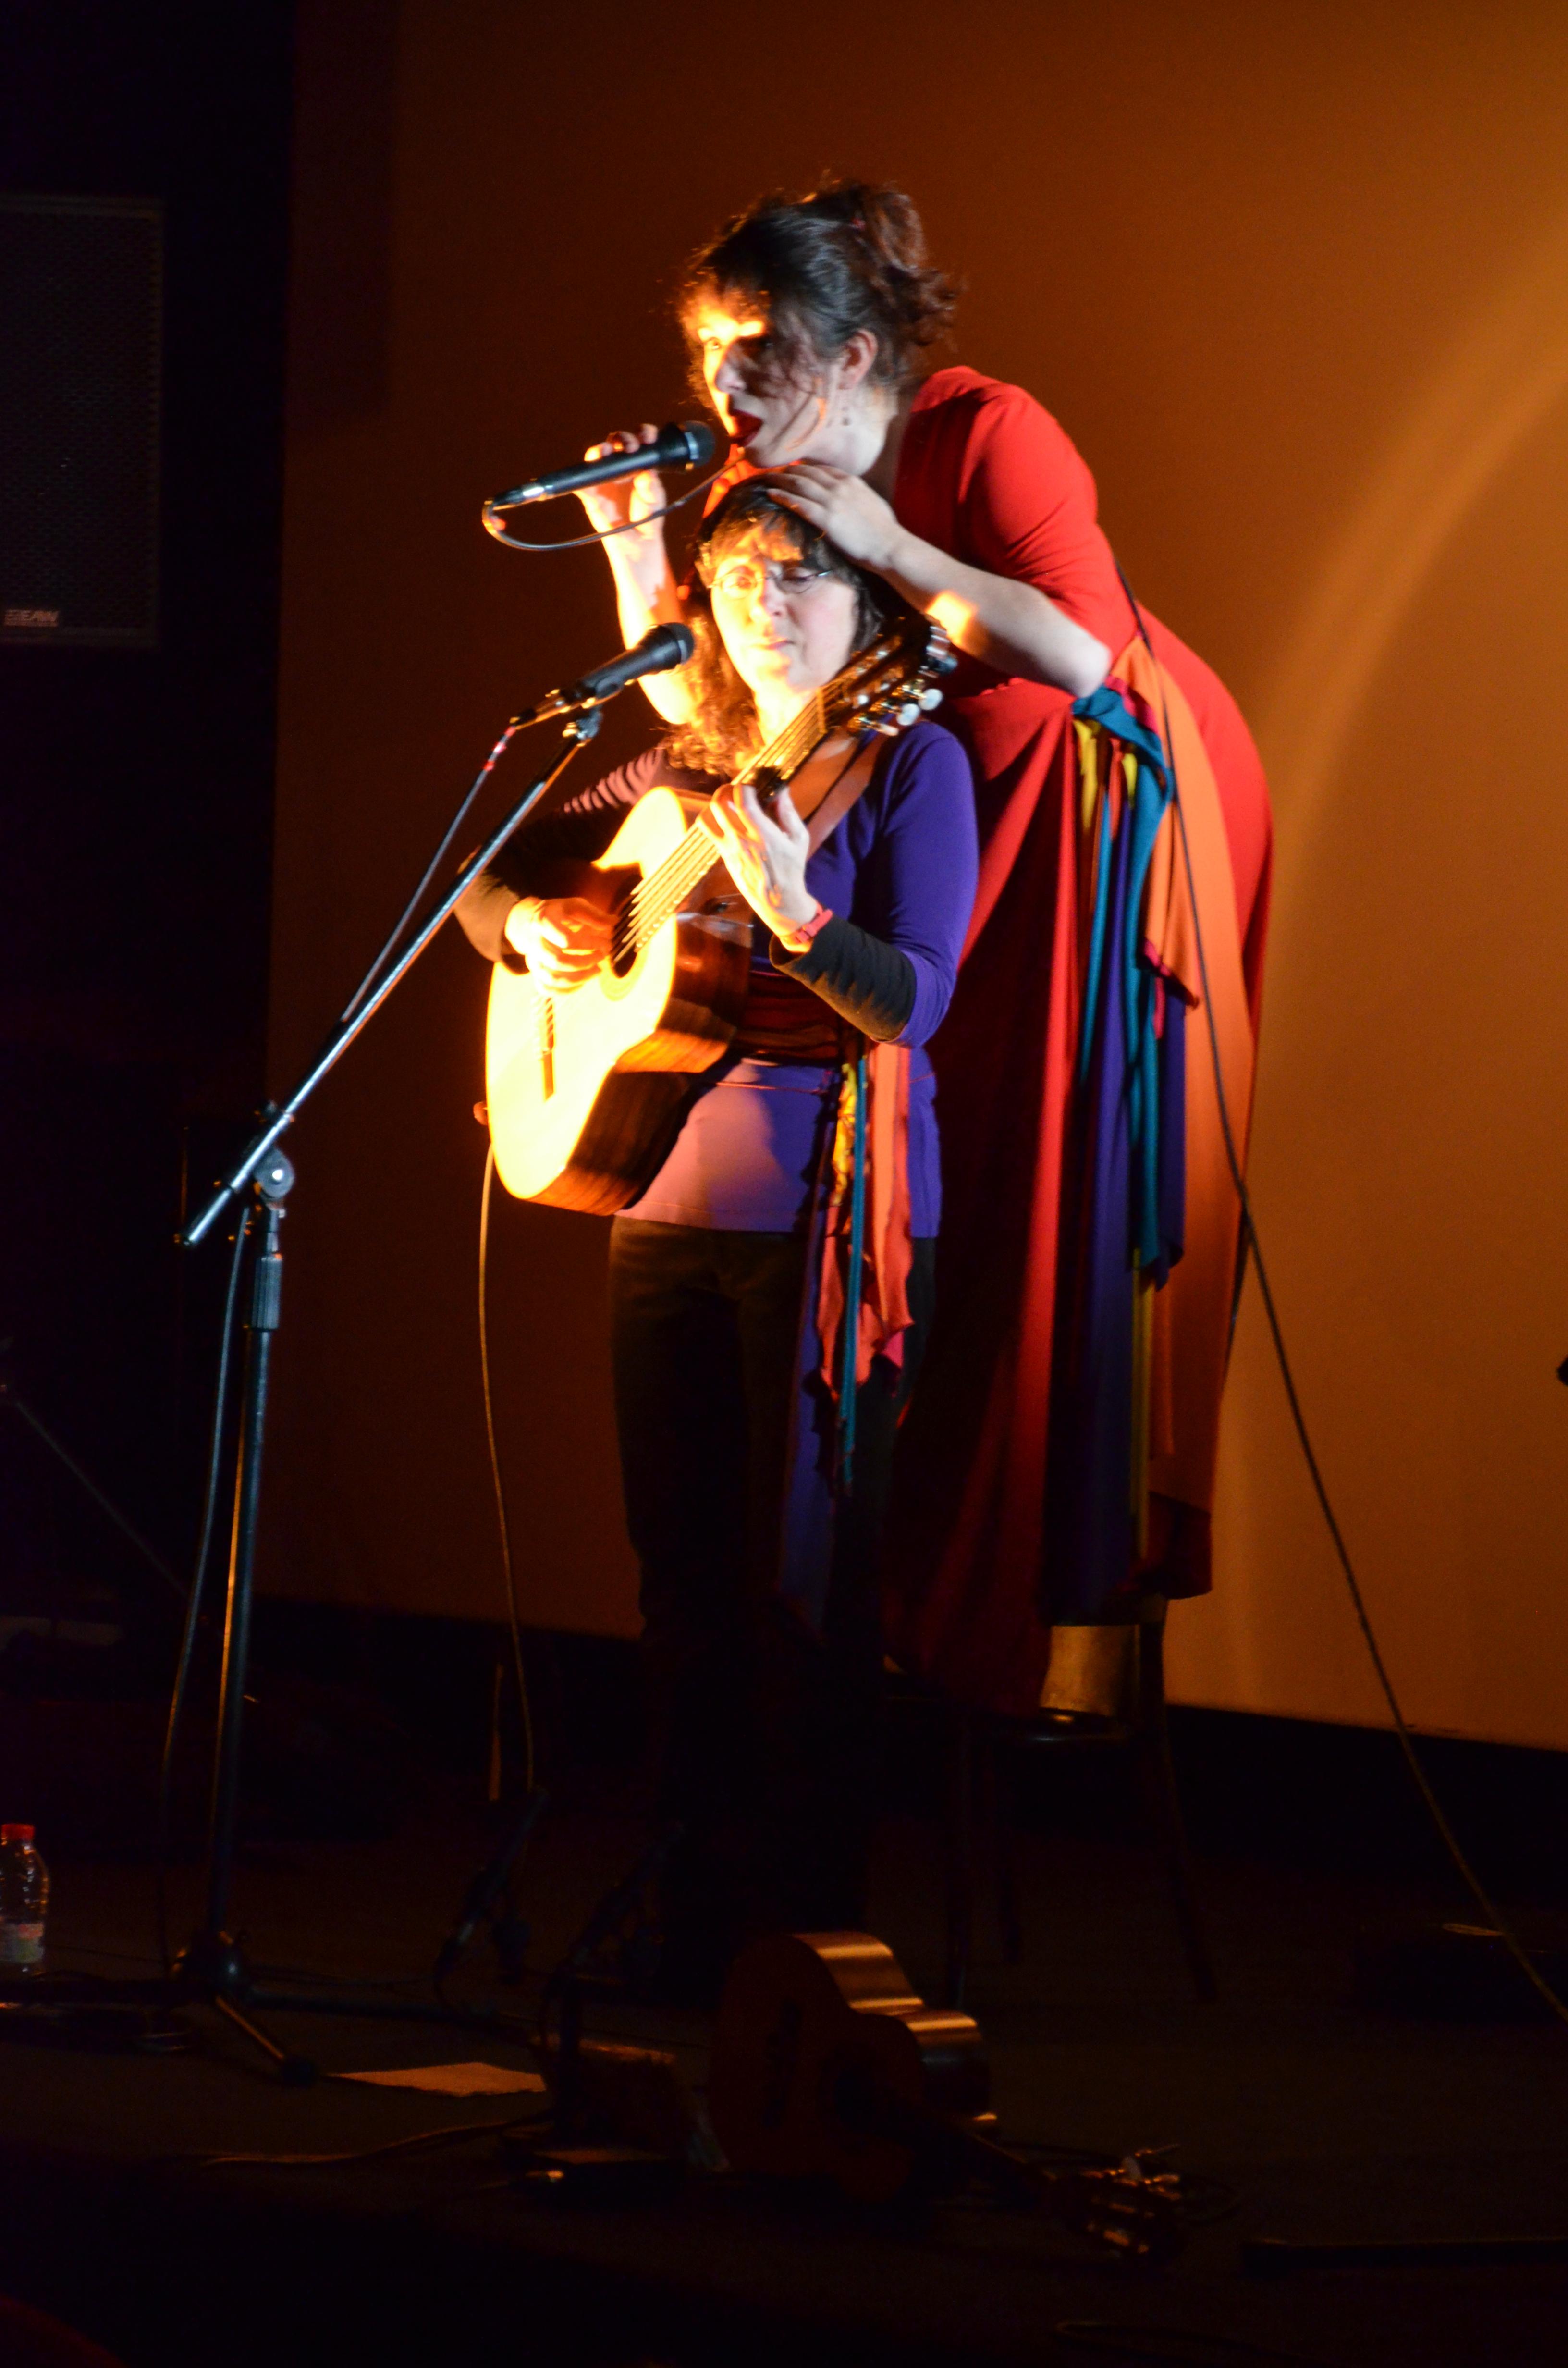 AURELIE_VERIOCA_ANDANDO_JMF_Le_Rex_BRIVE_Janv2015_Photo_Michel_Cornuault6